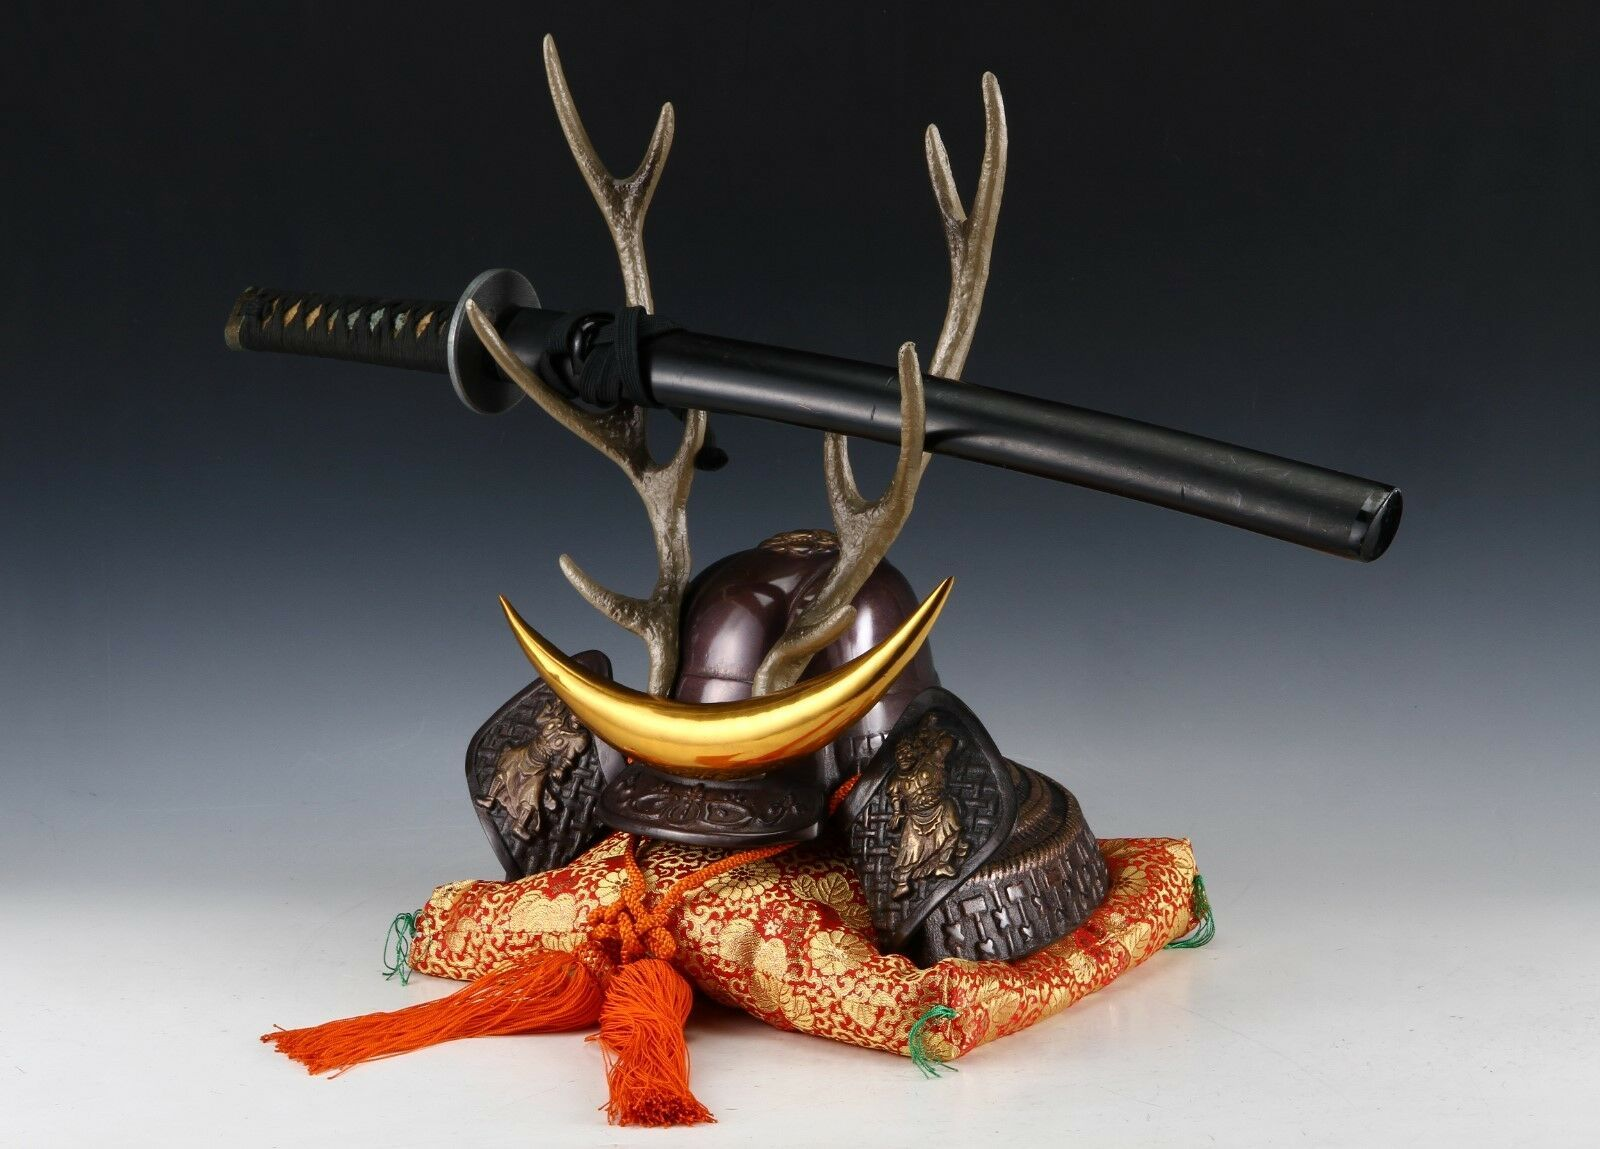 Japanese Beautiful Samurai Helmet -shikanosuke kabuto- with a Replica Blade image 3